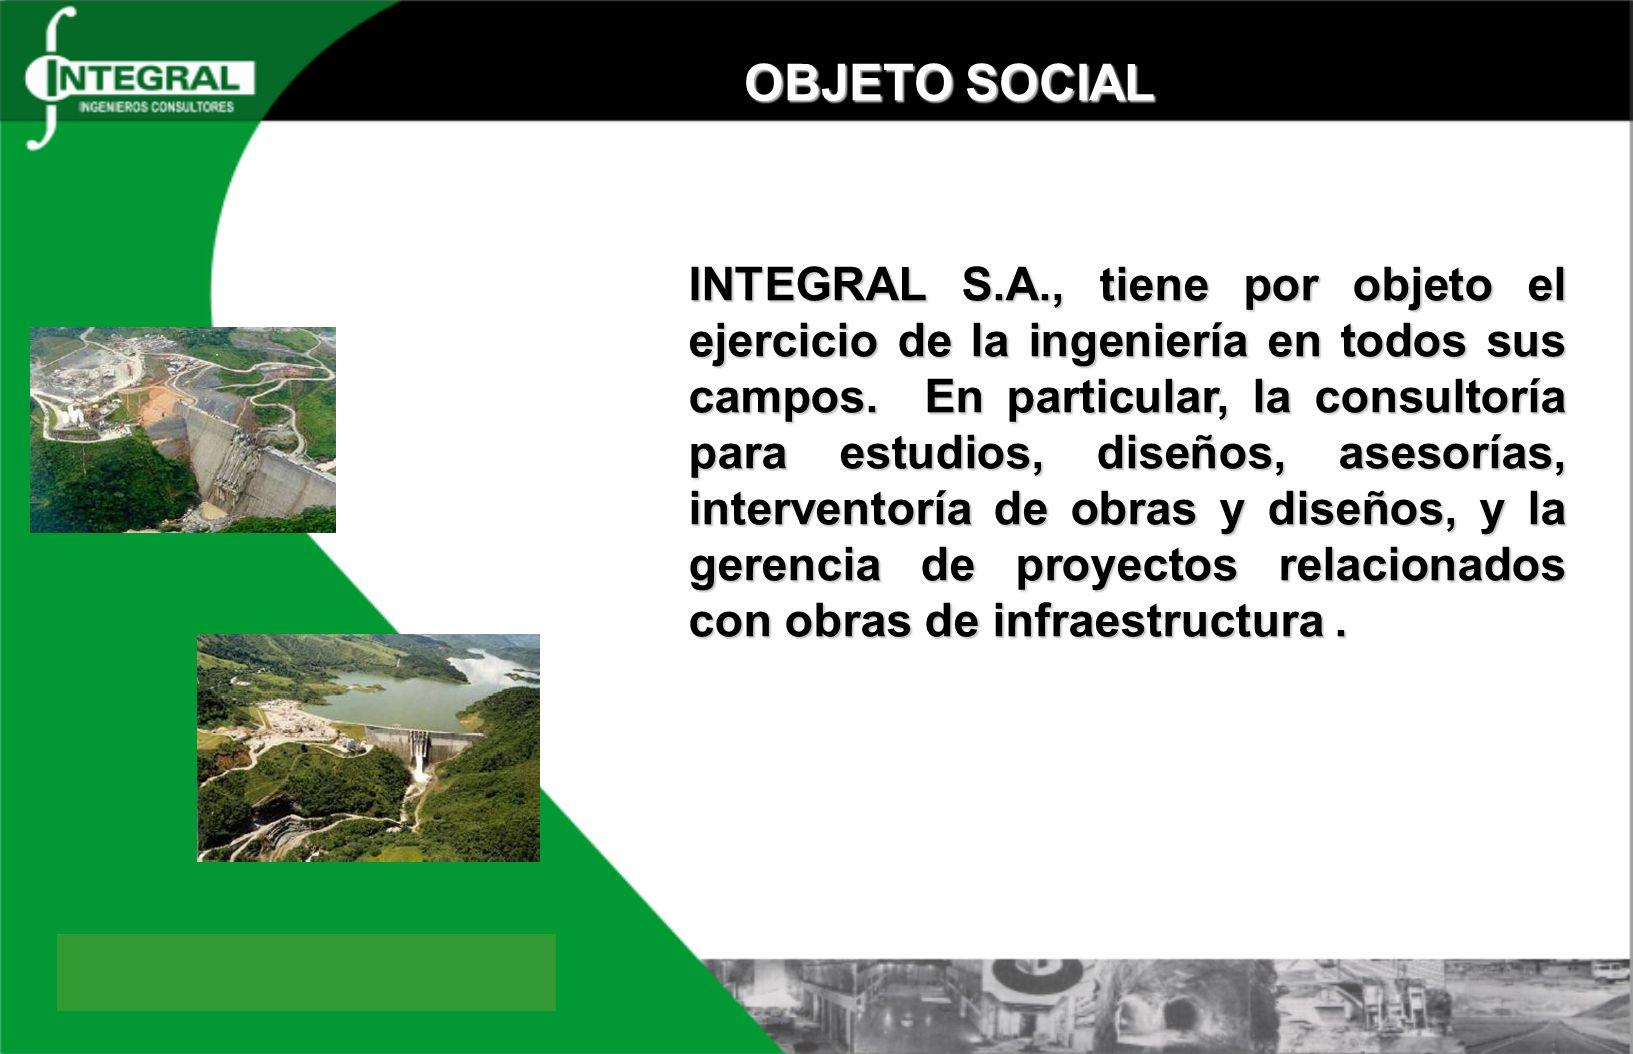 OBJETO SOCIAL